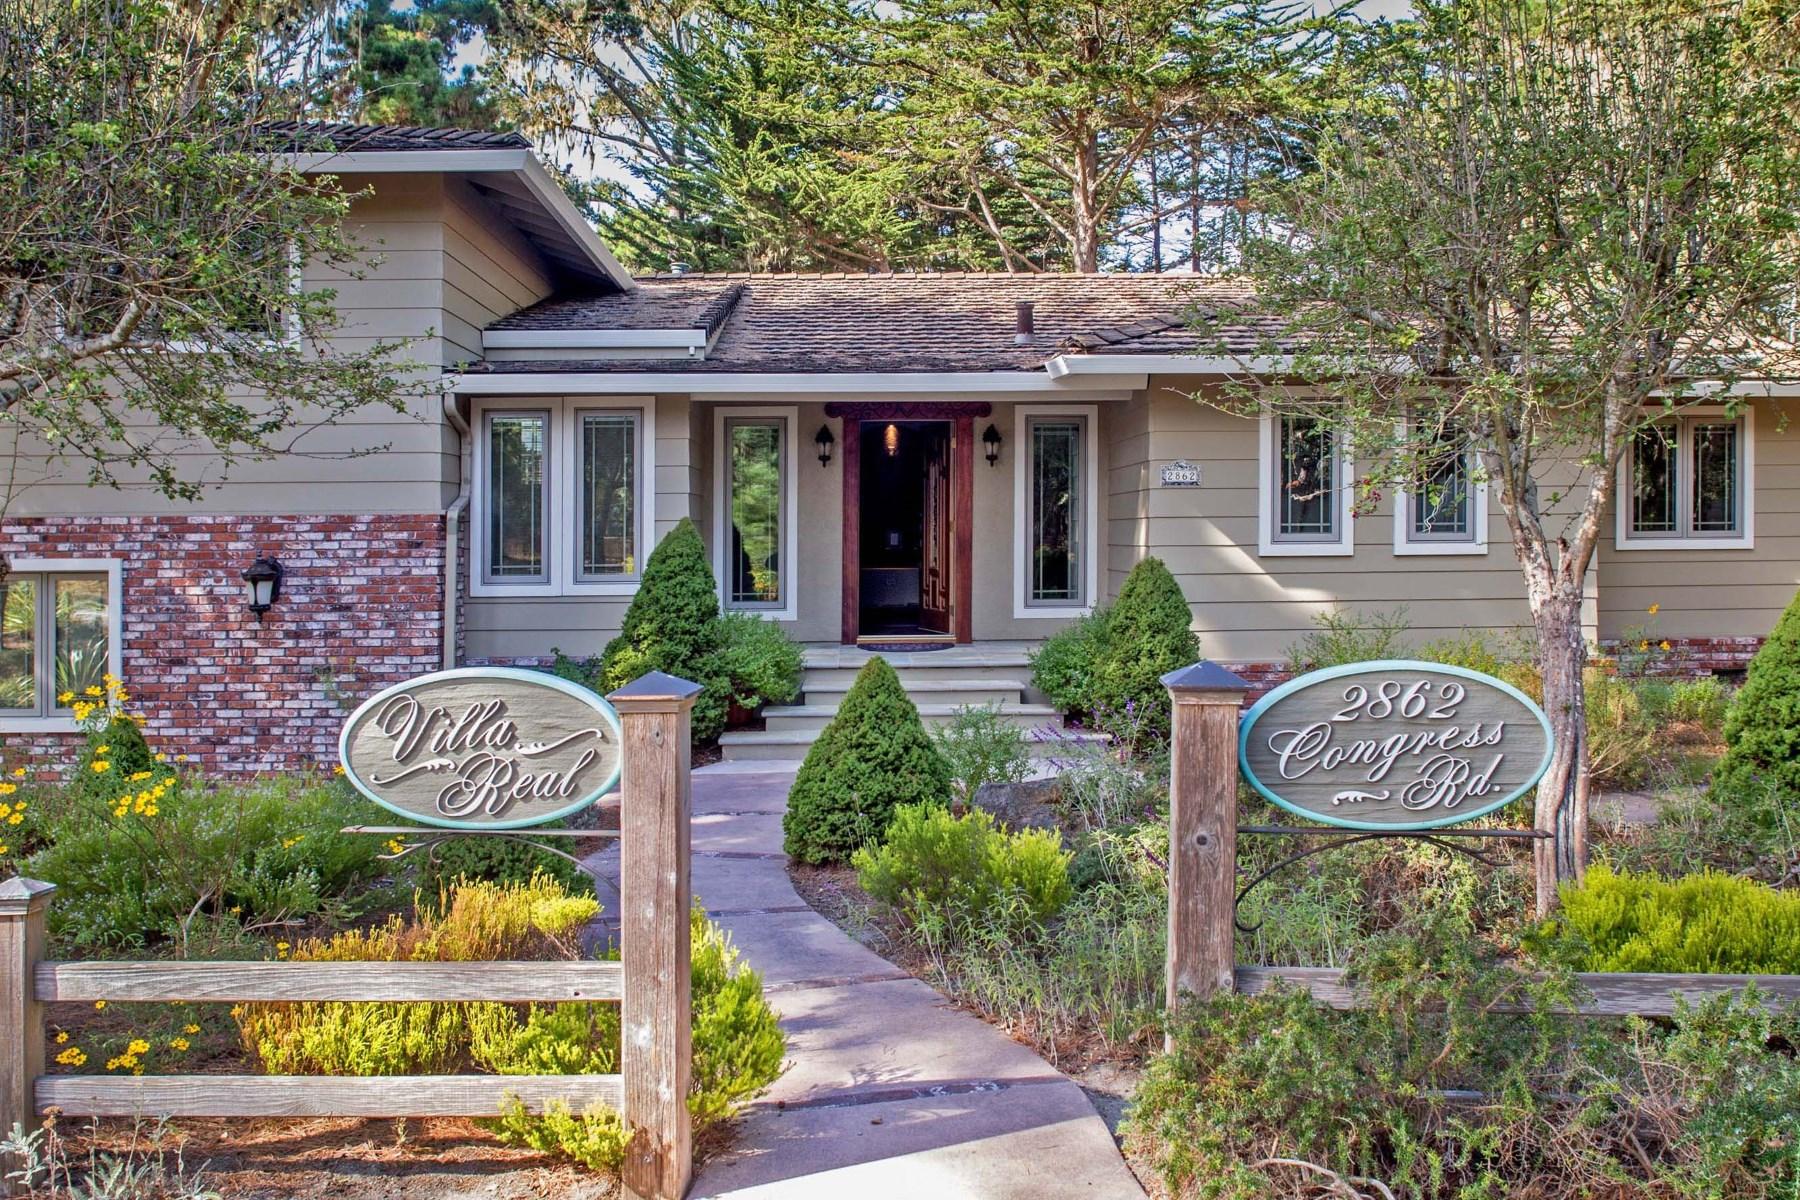 Casa Unifamiliar por un Venta en 2862 Congress Road, Pebble Beach Pebble Beach, California, 93953 Estados Unidos